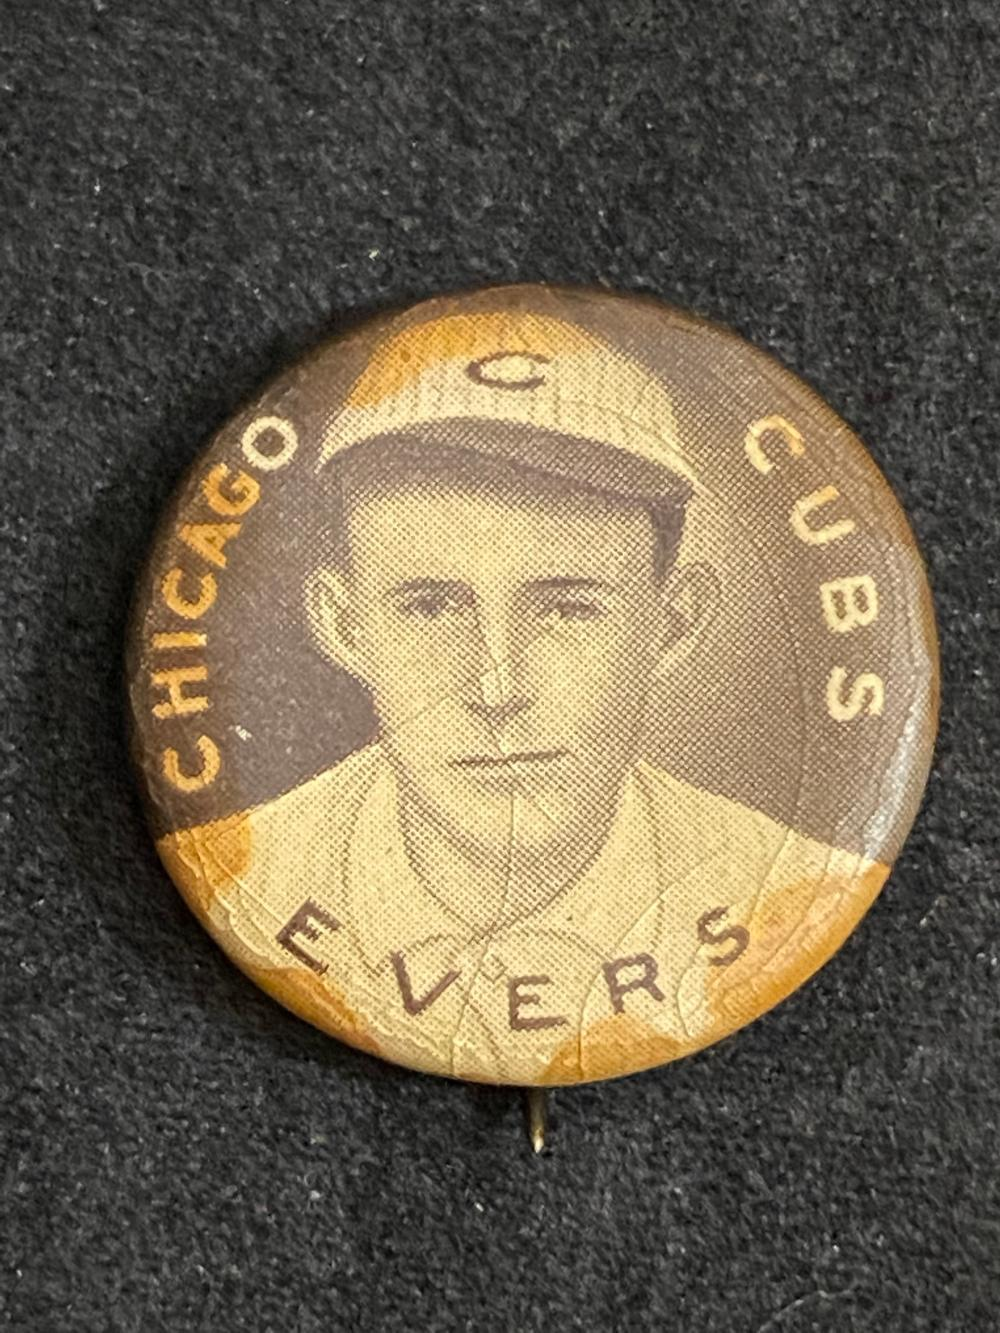 1912 Sweet Caporal Johnny Evers Pin - HOF (Washington Senators)